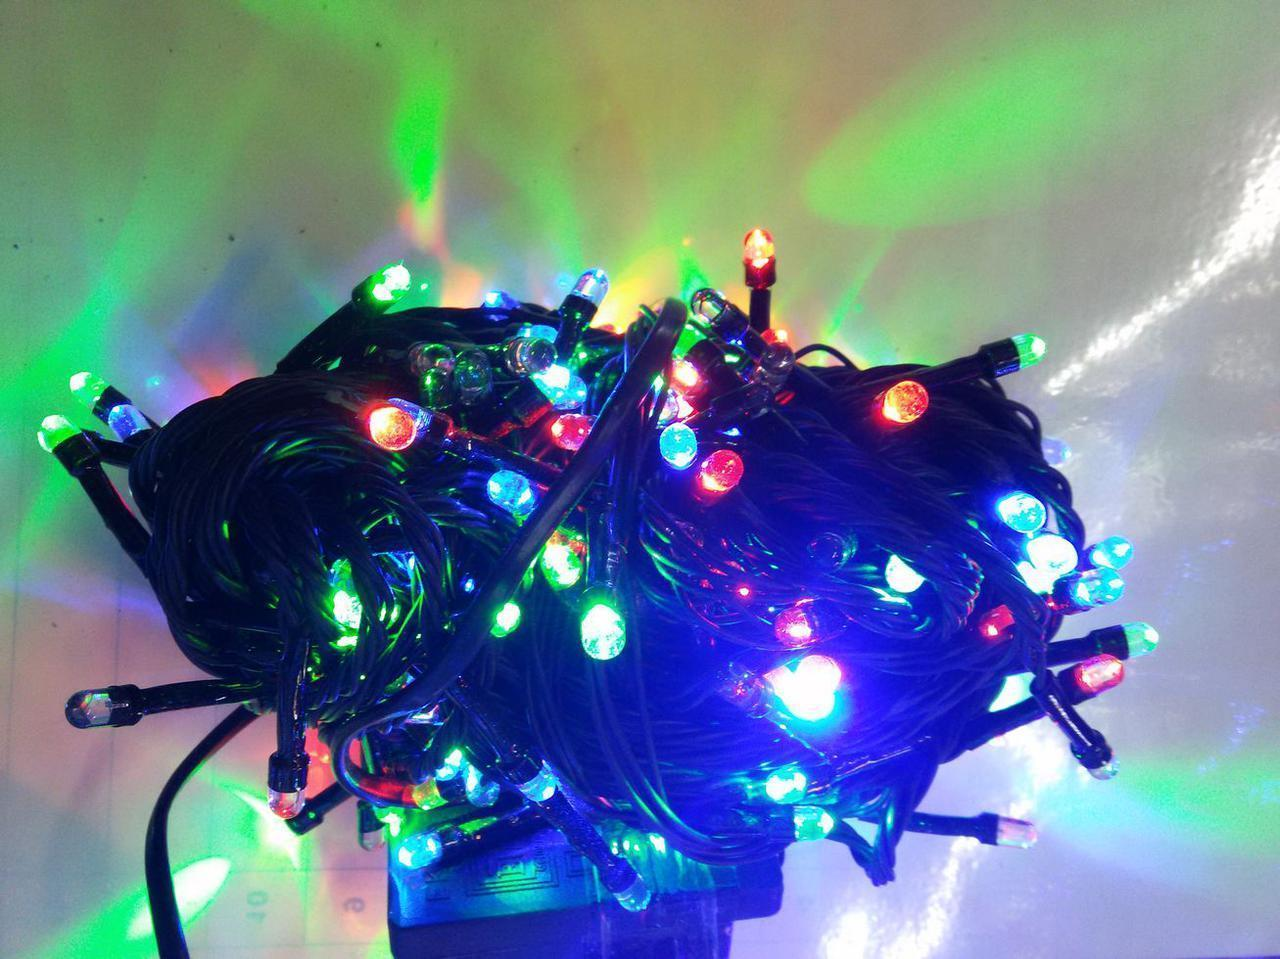 Гирлянда  ЛИЗА  400 LED5mm  на черном проводе, разноцветная